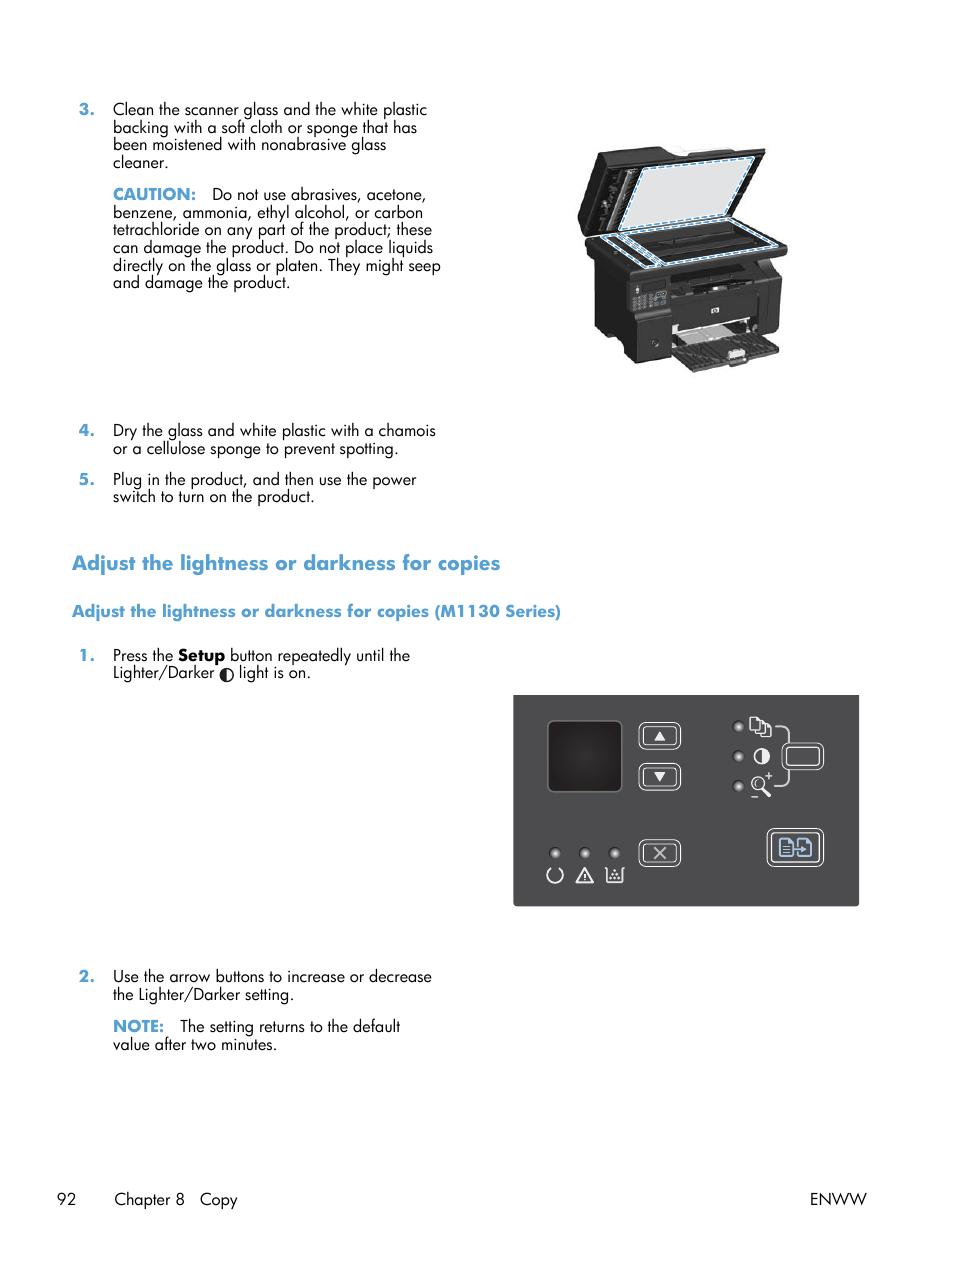 Adjust the lightness or darkness for copies   HP laserjet m1212nf User  Manual   Page 106 / 284